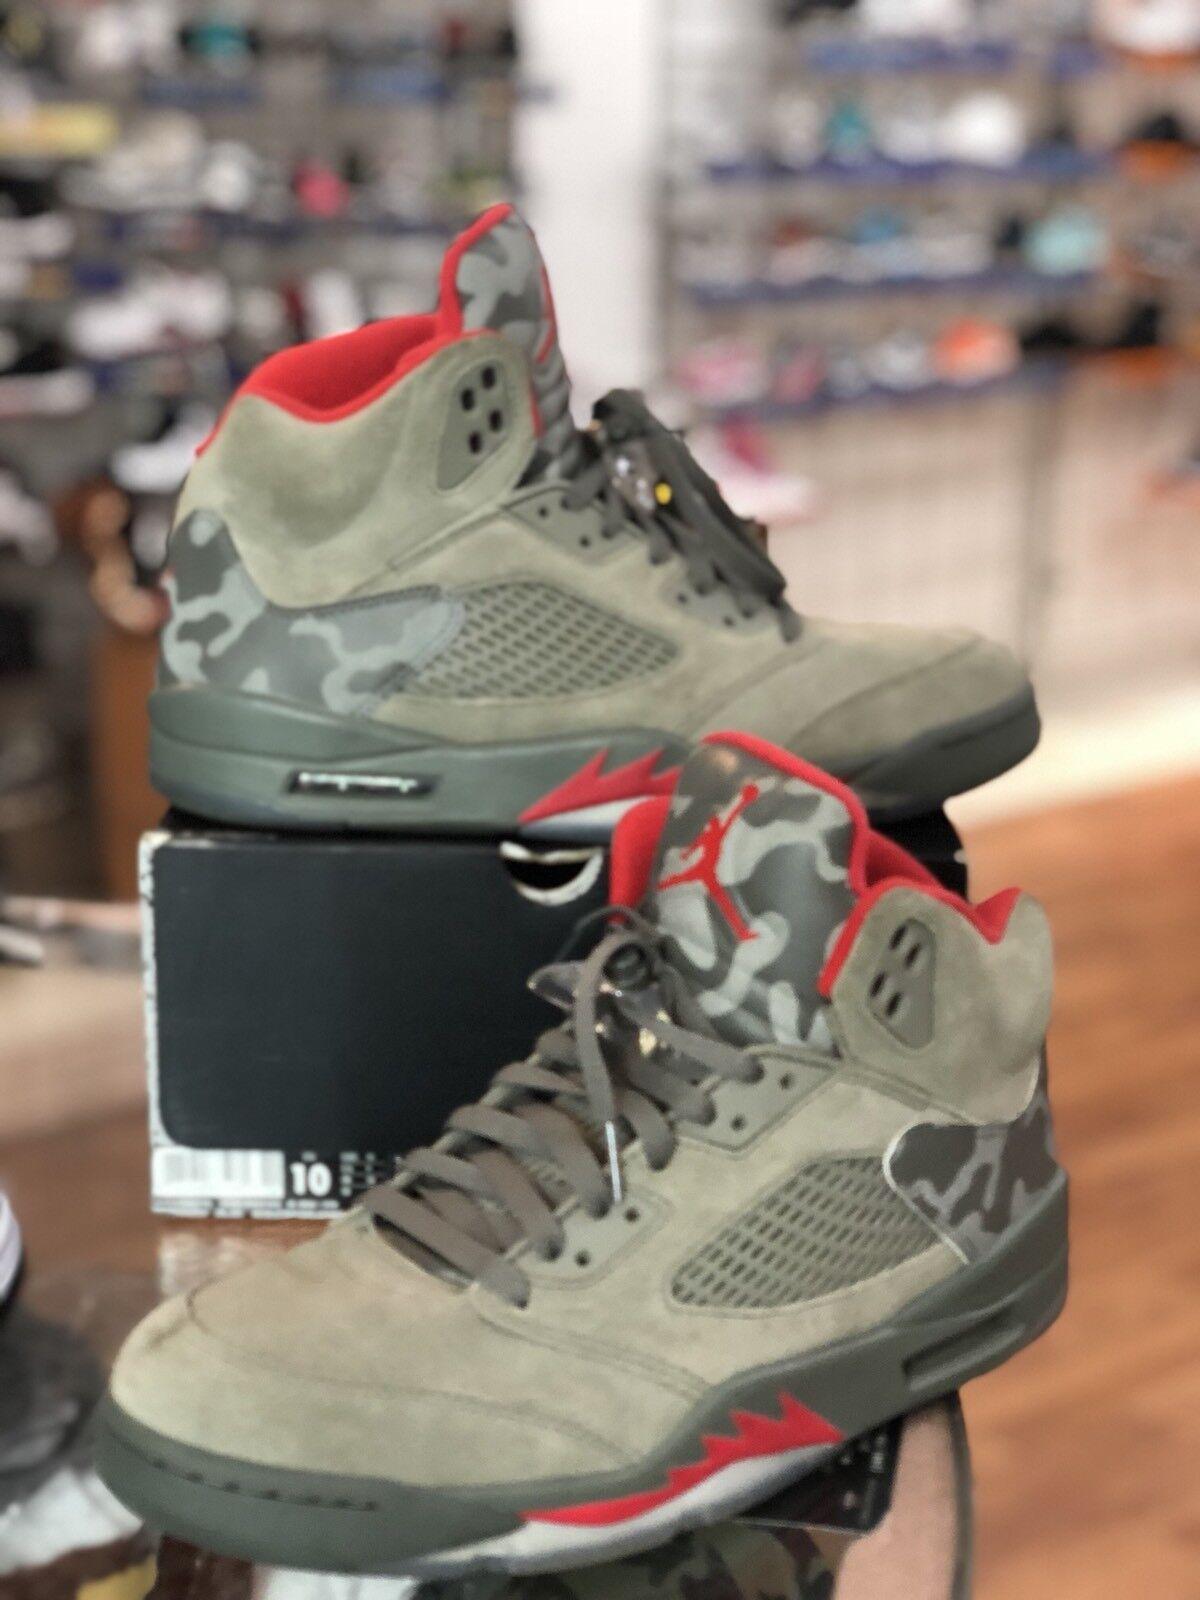 Nike Air Jordan Retro P51 136027-051 5 V Dark Stucco 136027-051 P51 Camo Camoflauge Sz 10 ef8db8